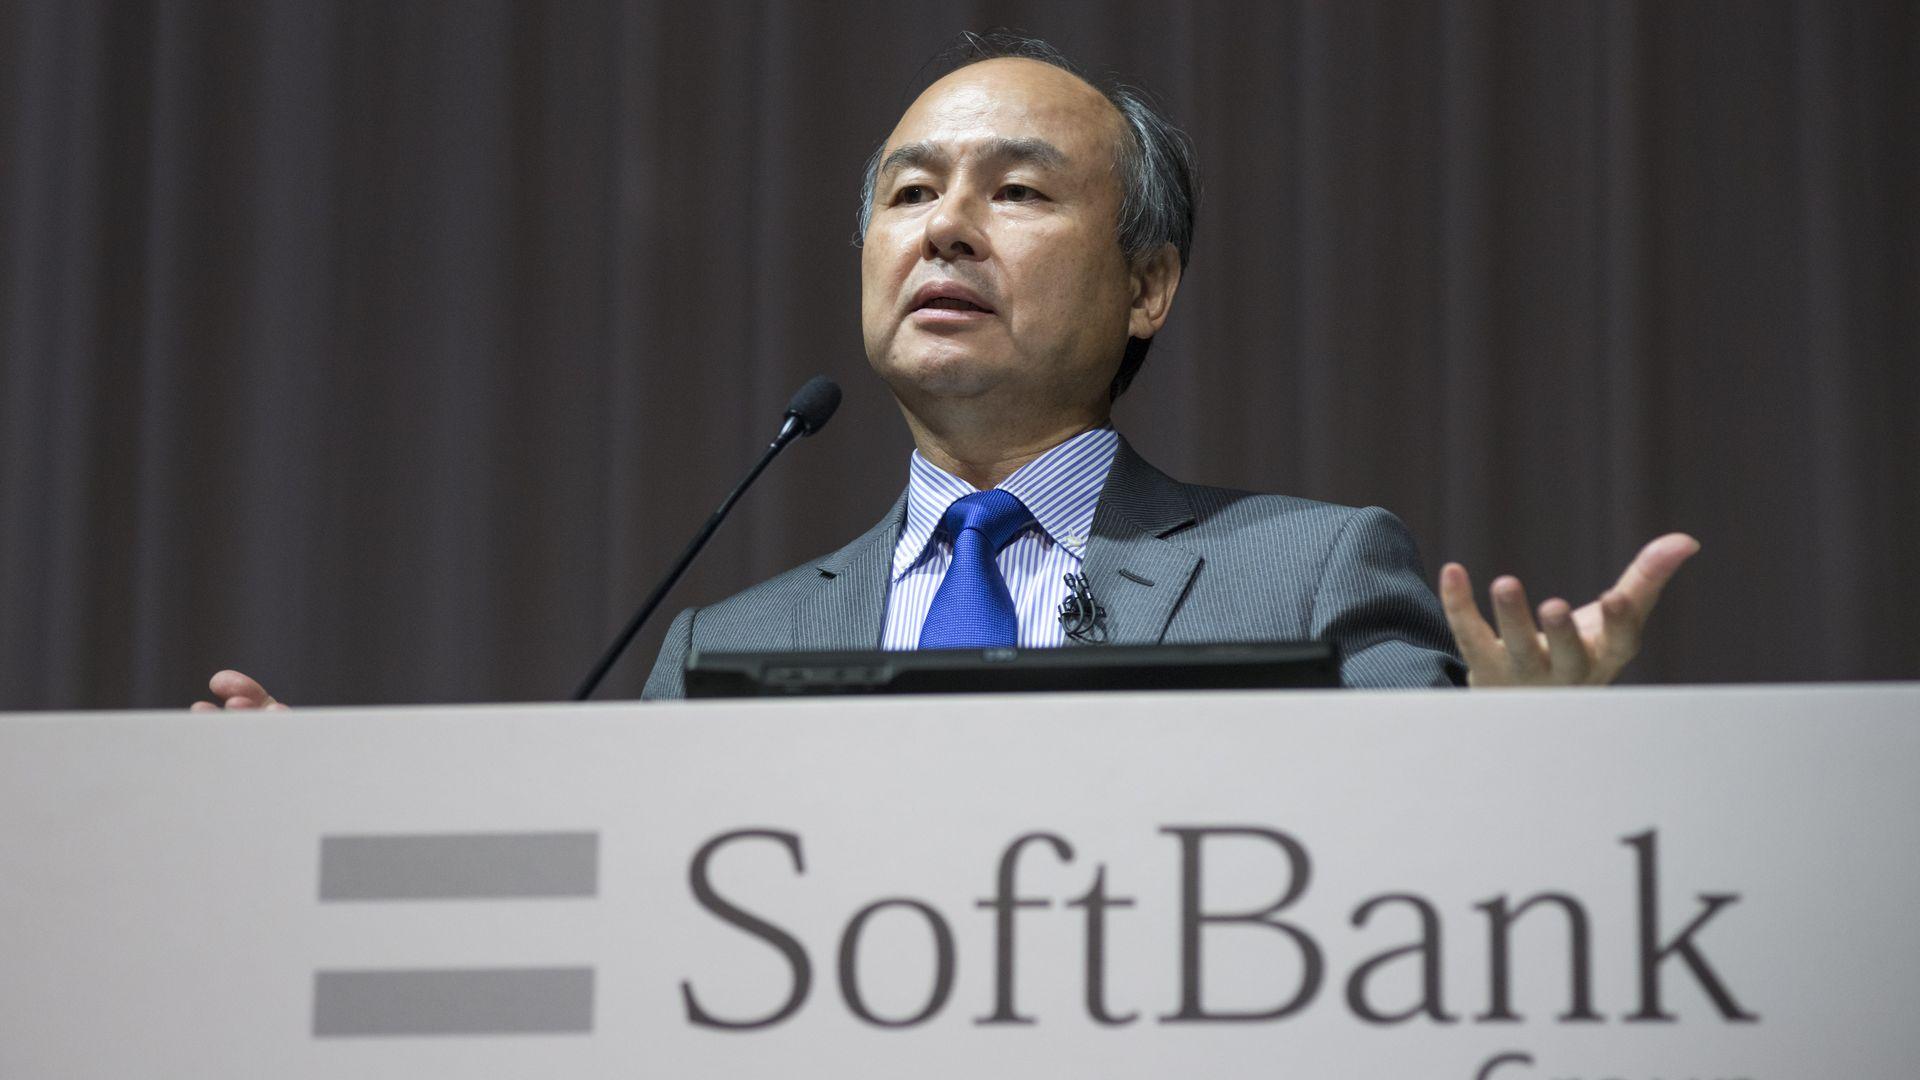 Photo of SoftBank CEO Masayoshi Son at quarterly earnings presentation.